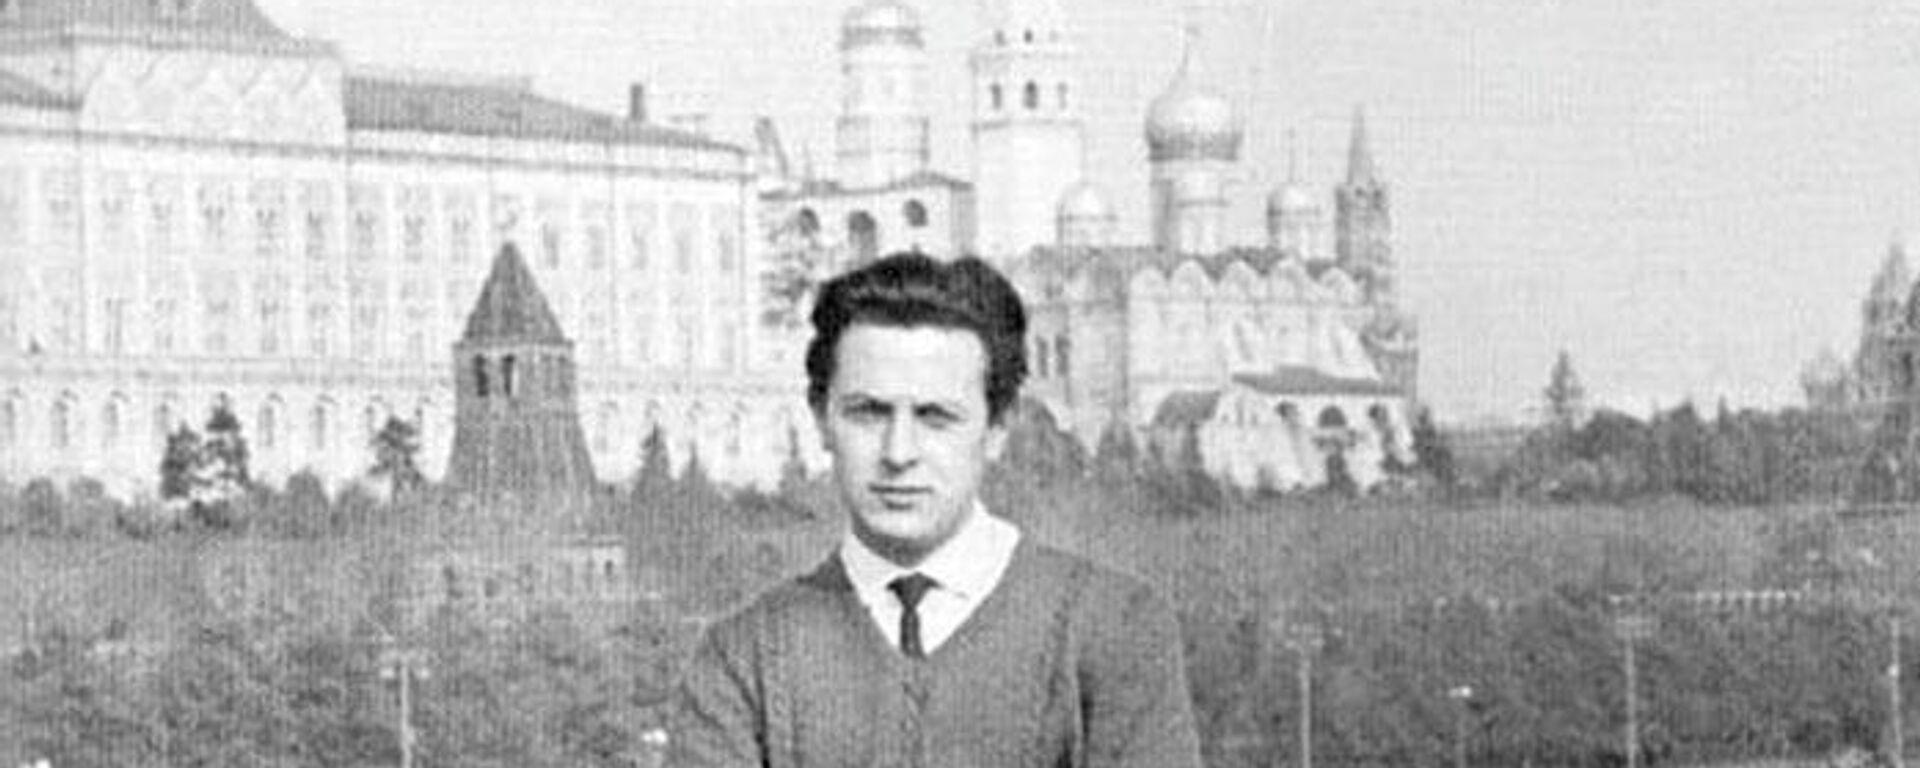 Vladimir Roslik en Moscú - Sputnik Mundo, 1920, 02.08.2021